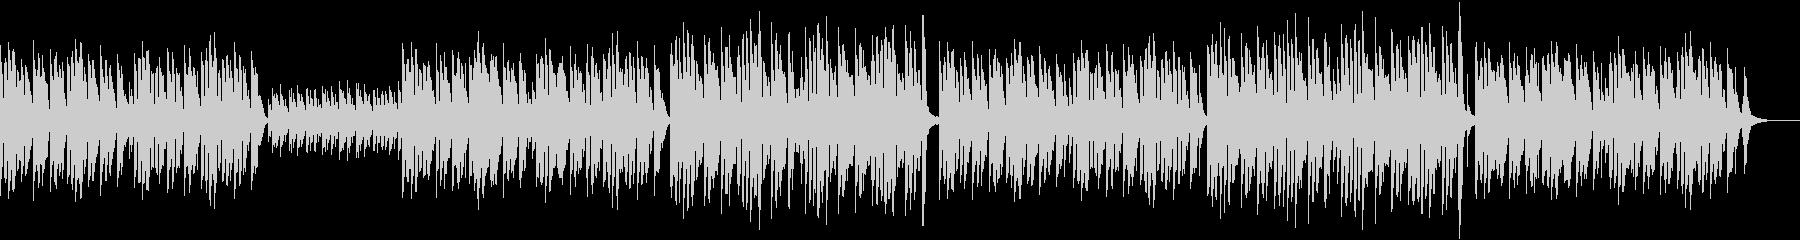 bpm108 キッズTikTok可愛い笛の未再生の波形